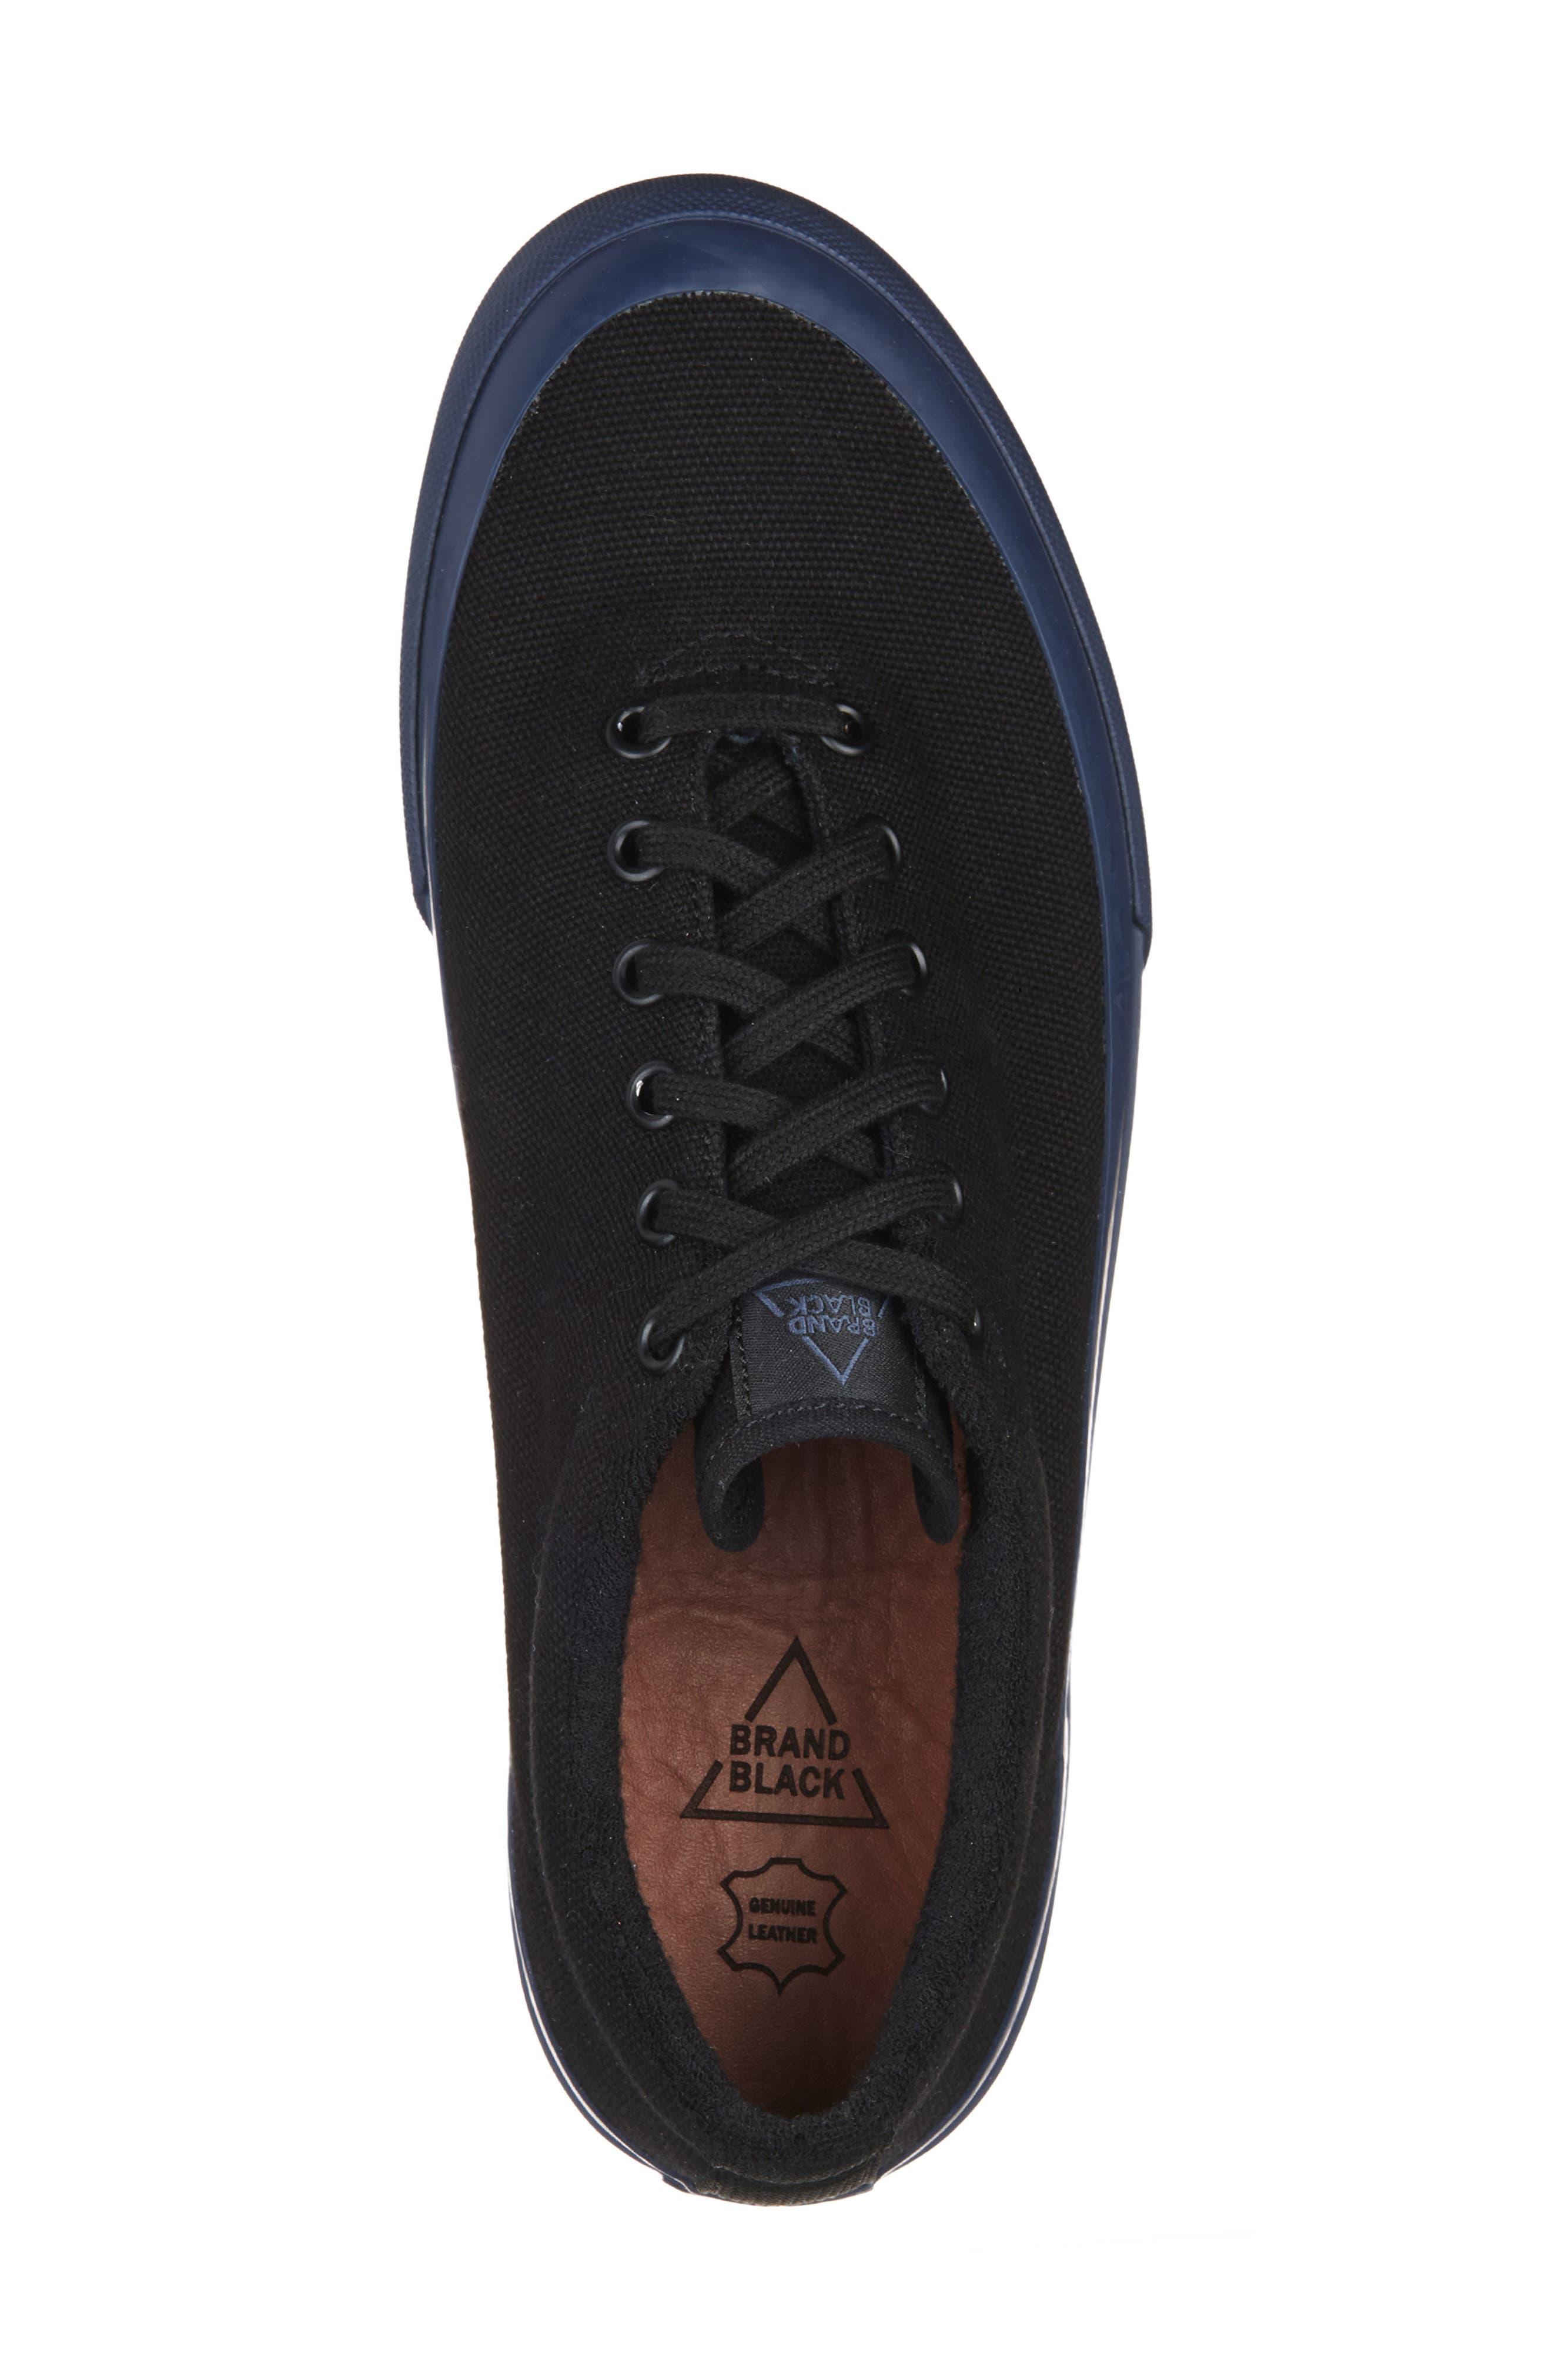 Vesta Low Top Sneaker,                             Alternate thumbnail 5, color,                             BLACK/ NAVY